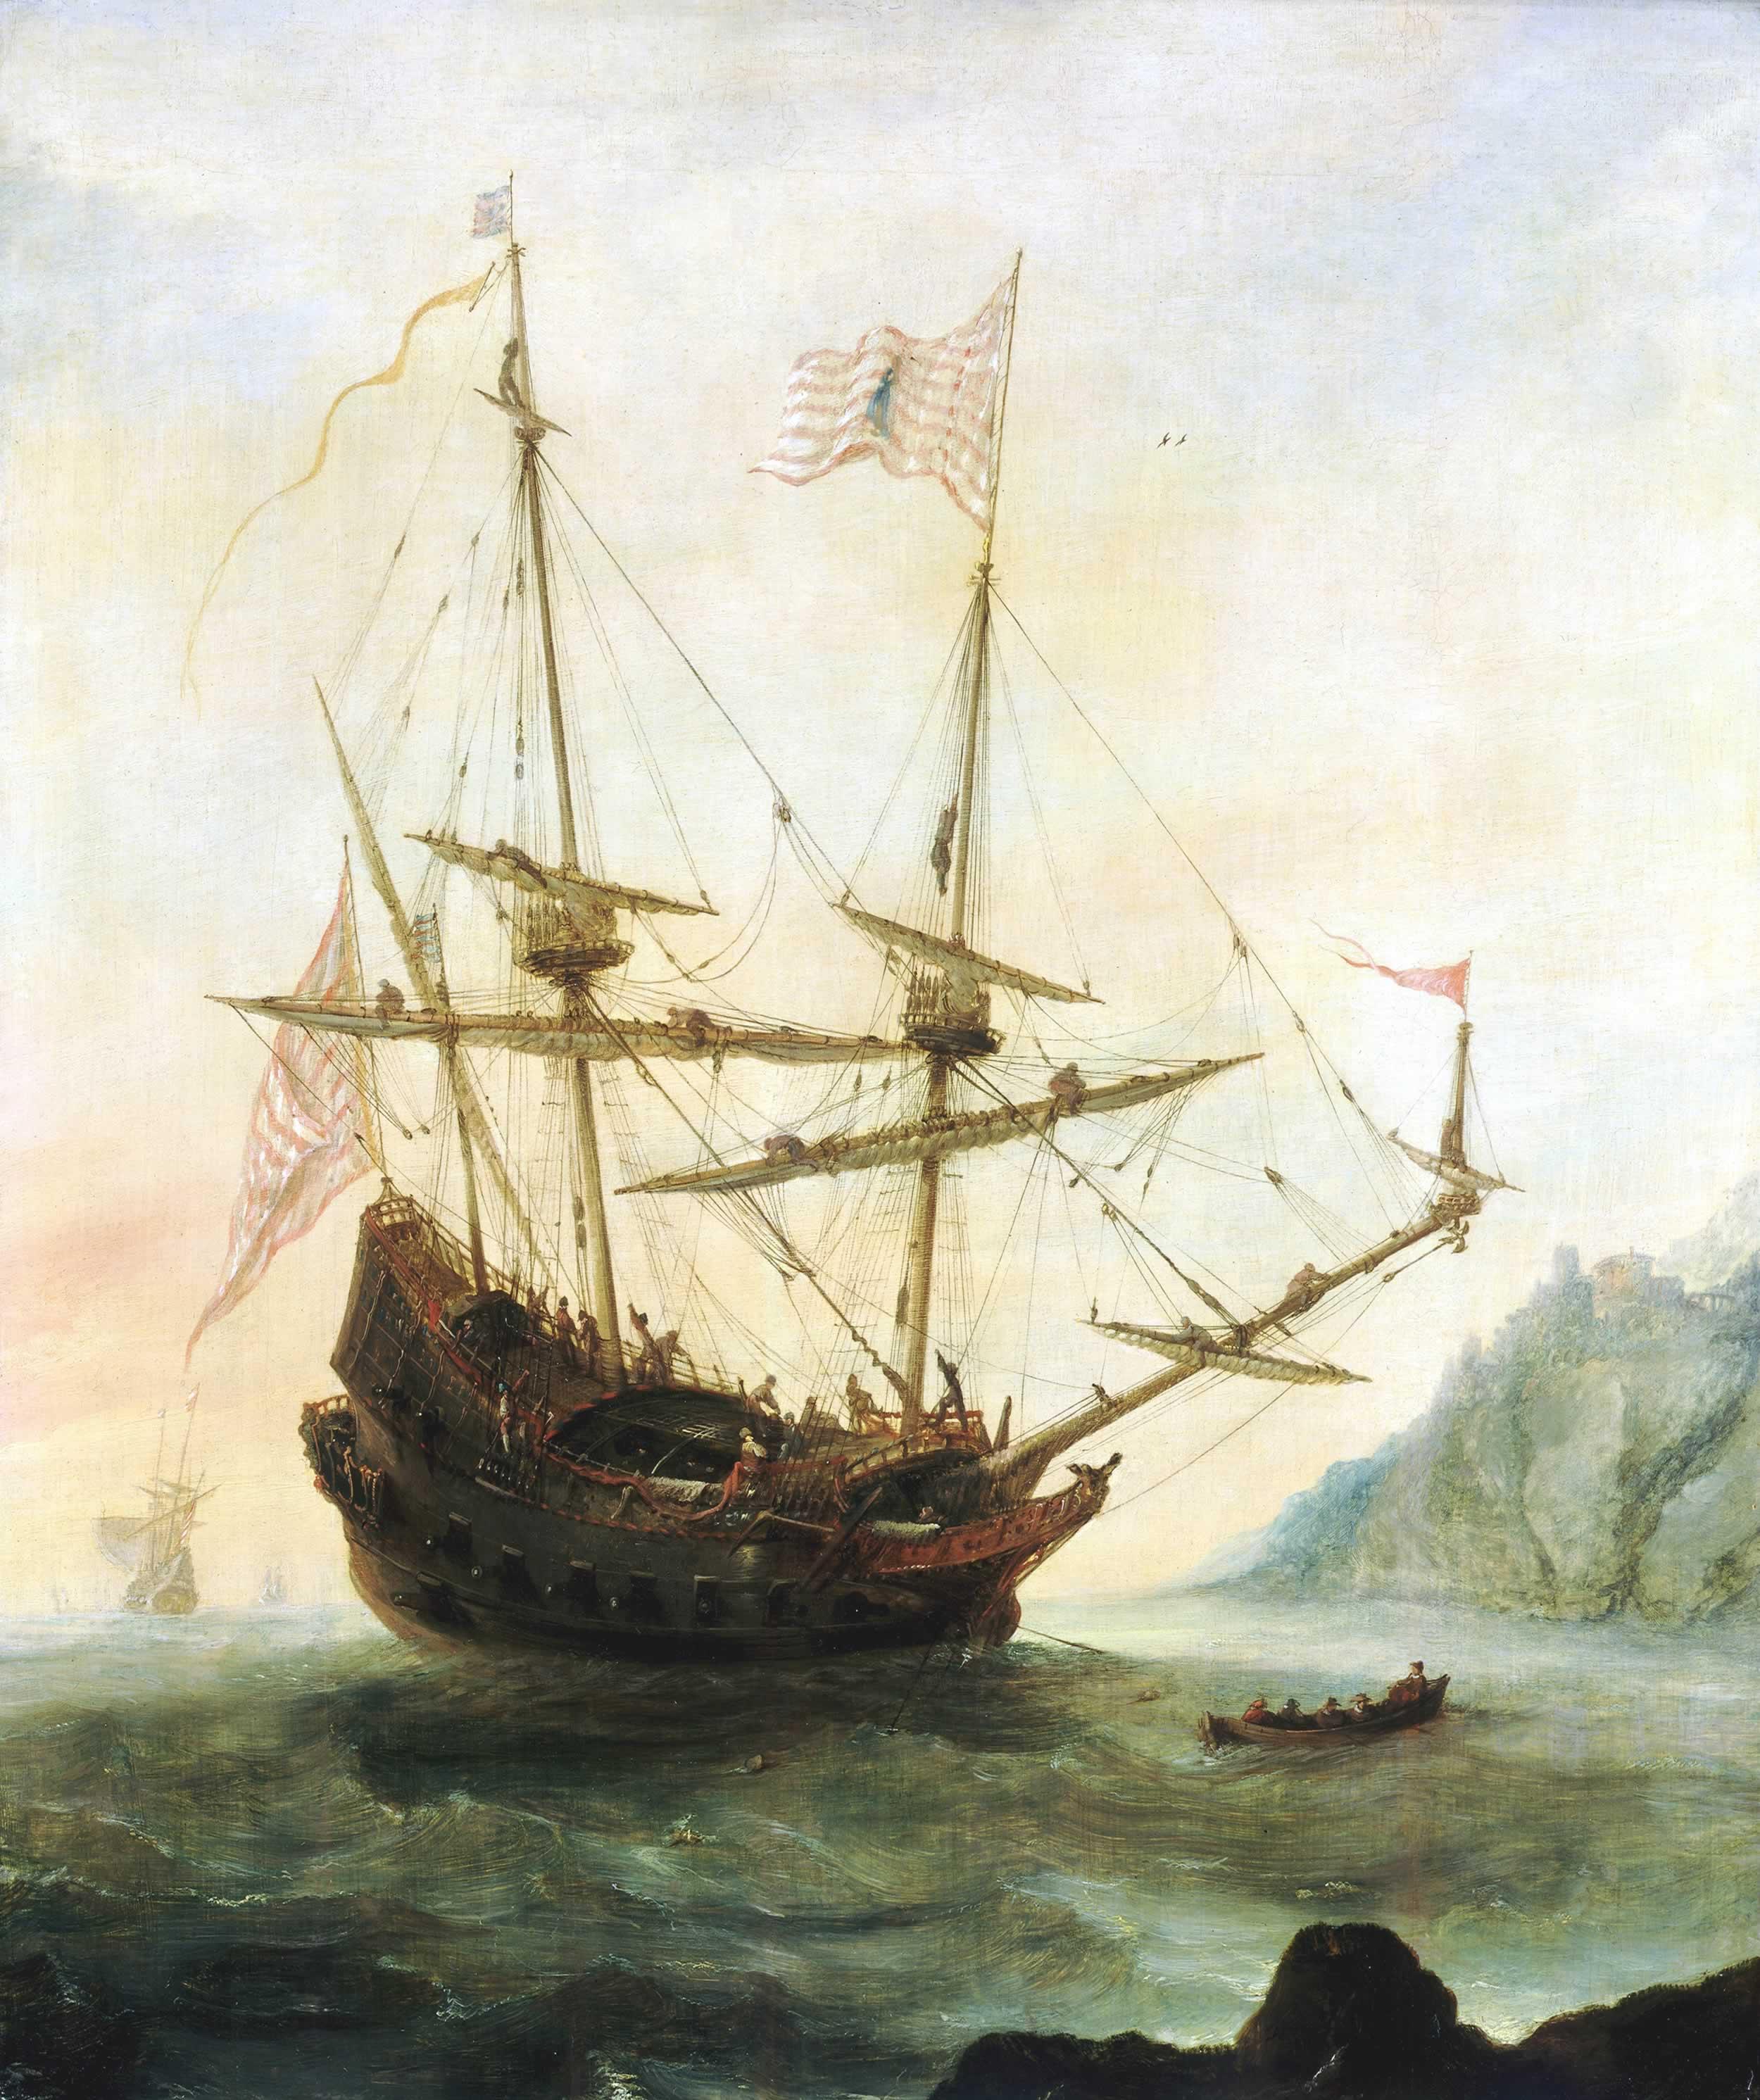 Charles Ferdinand Ship Traveled From Bremanhaven To Usa